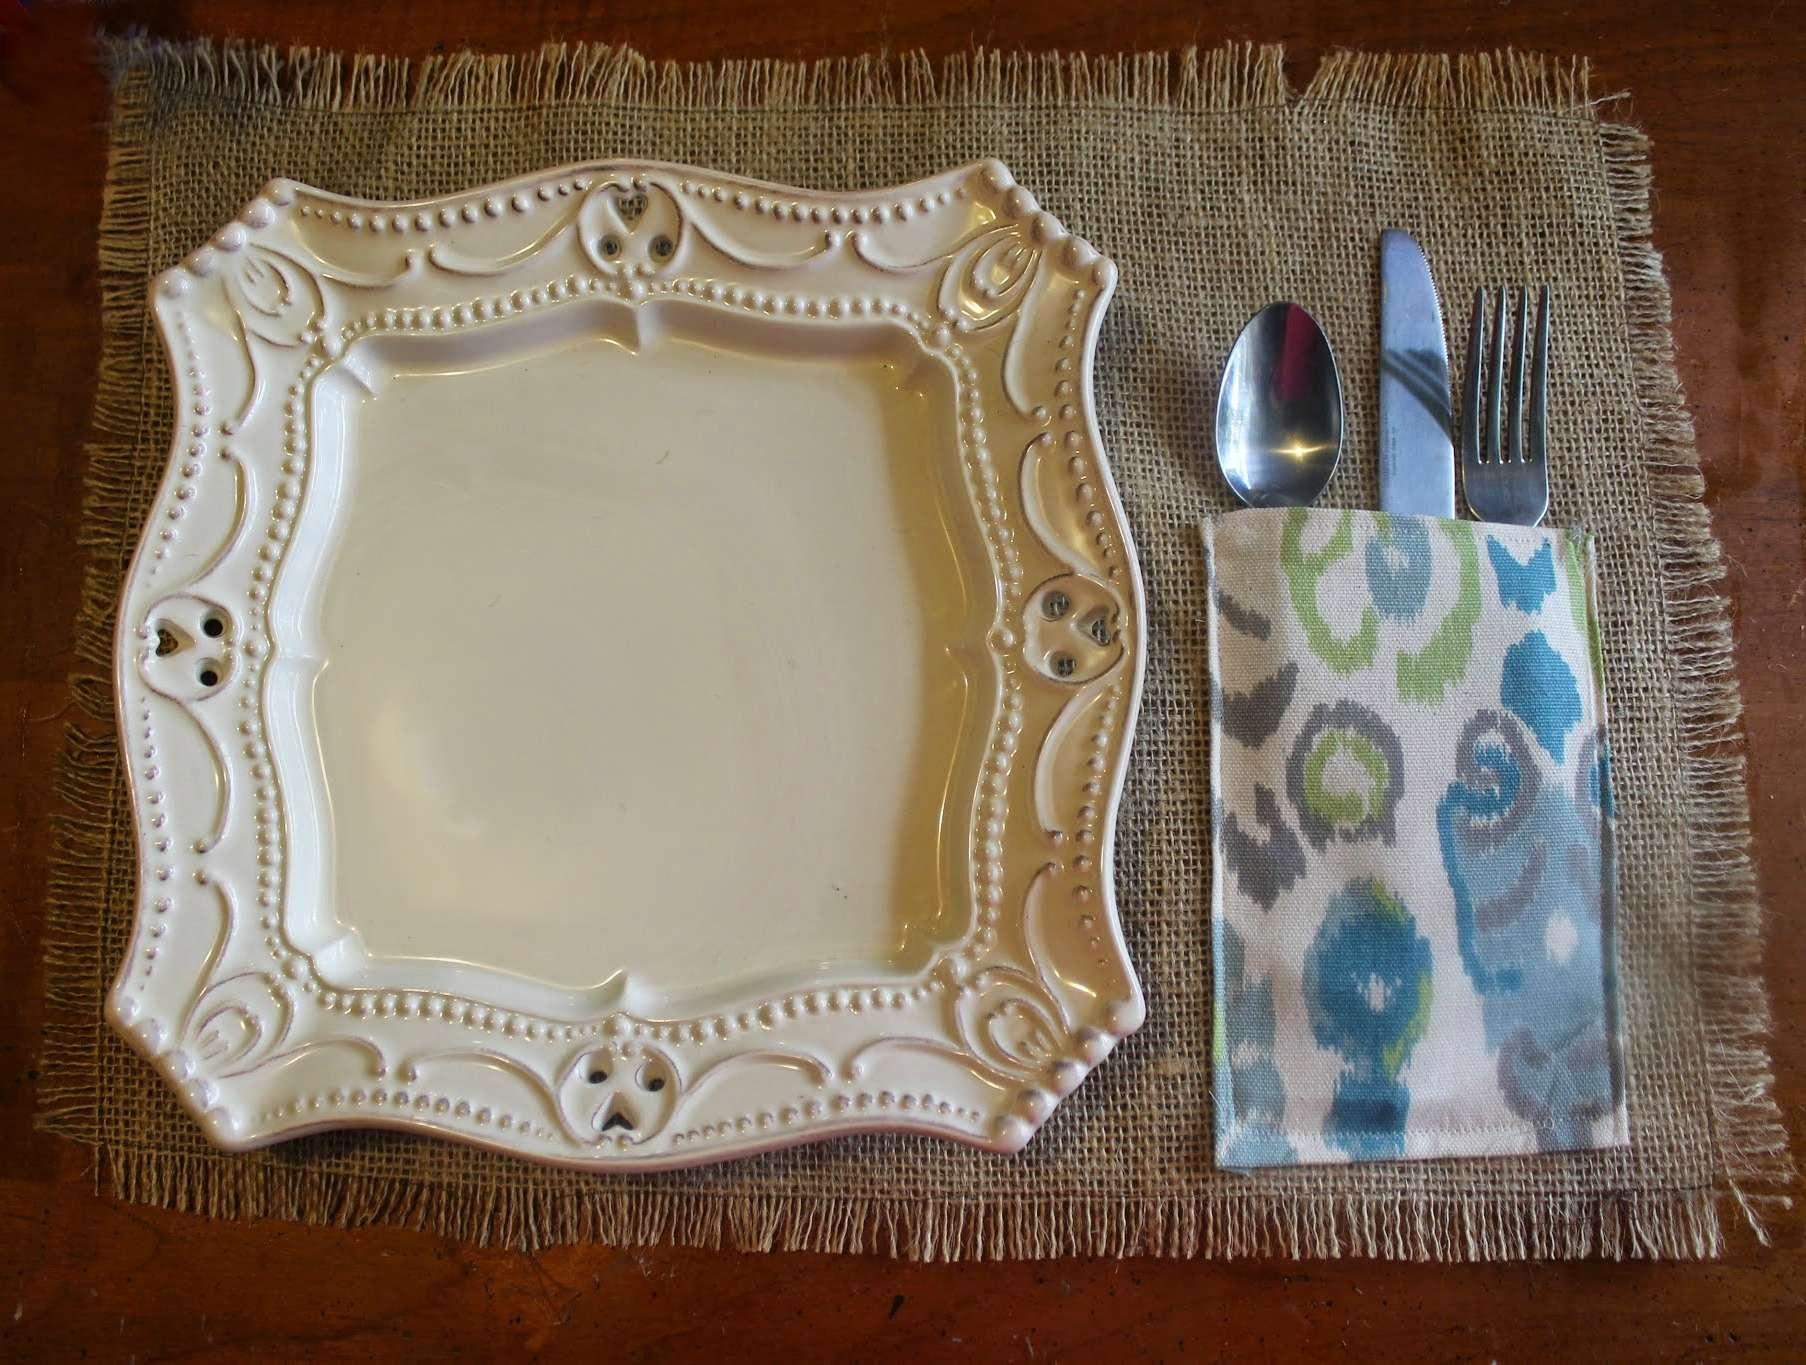 diy burlap placemat with silverware pocket